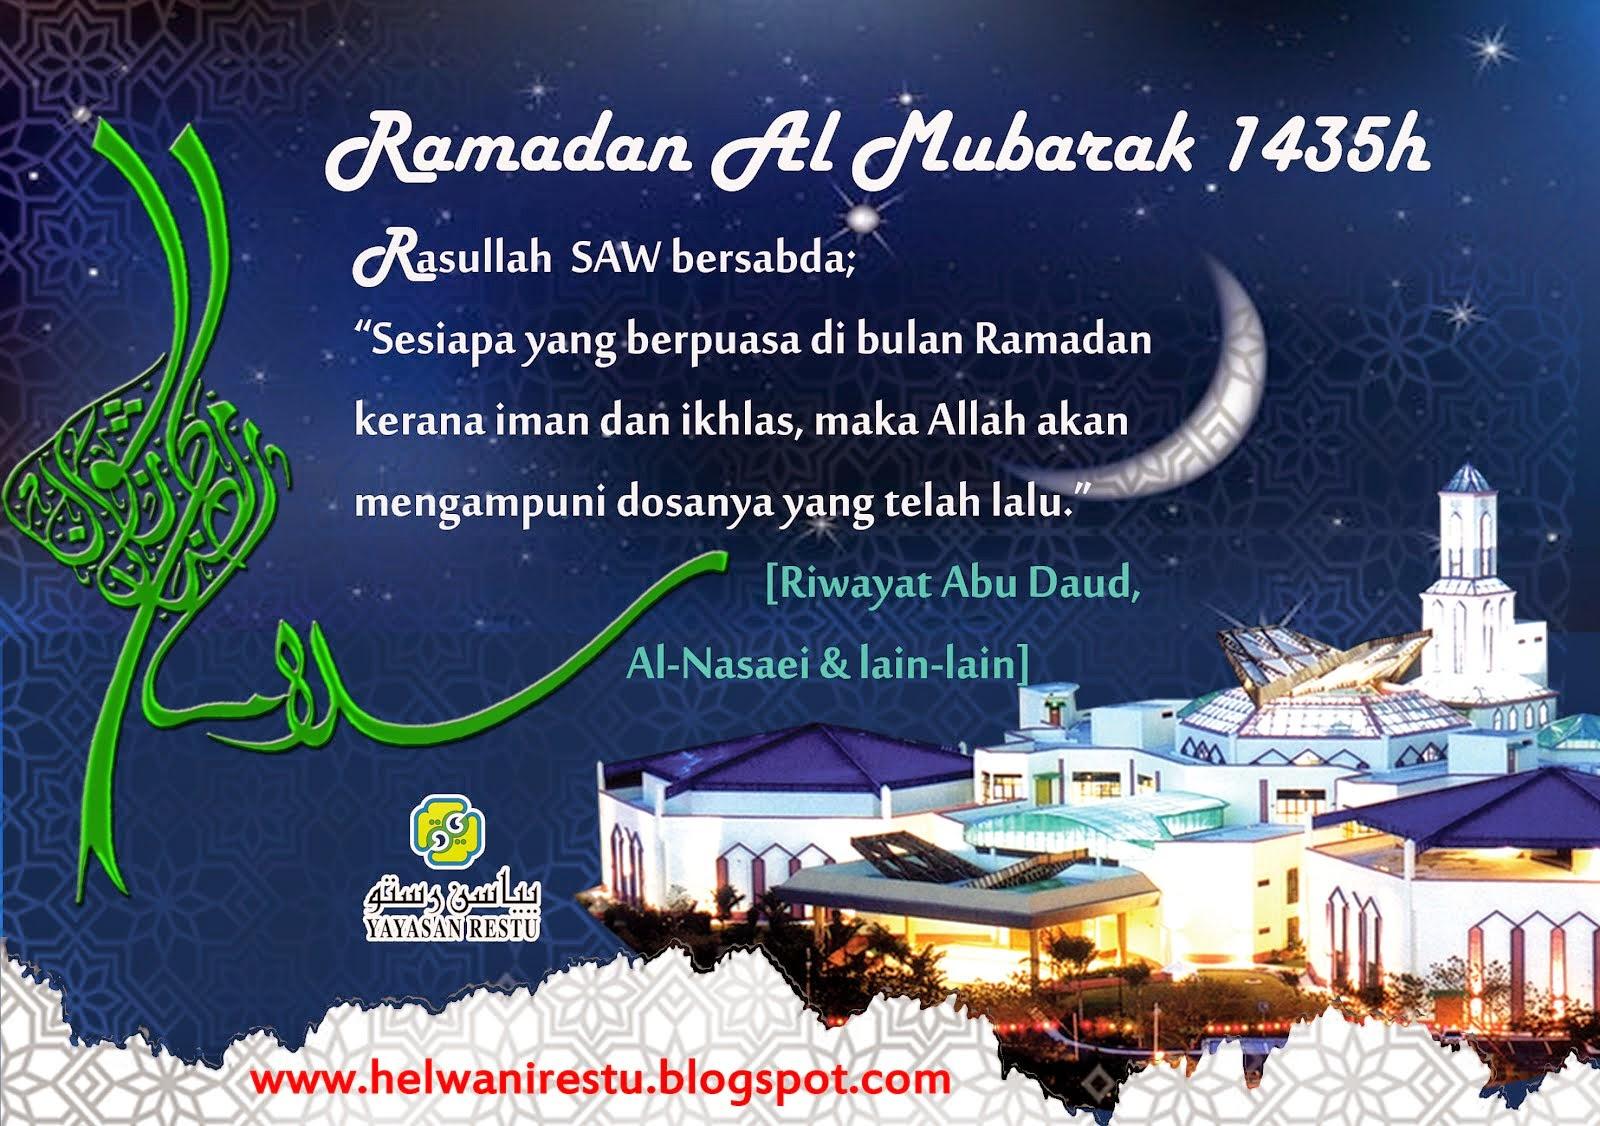 Salam Ramadan